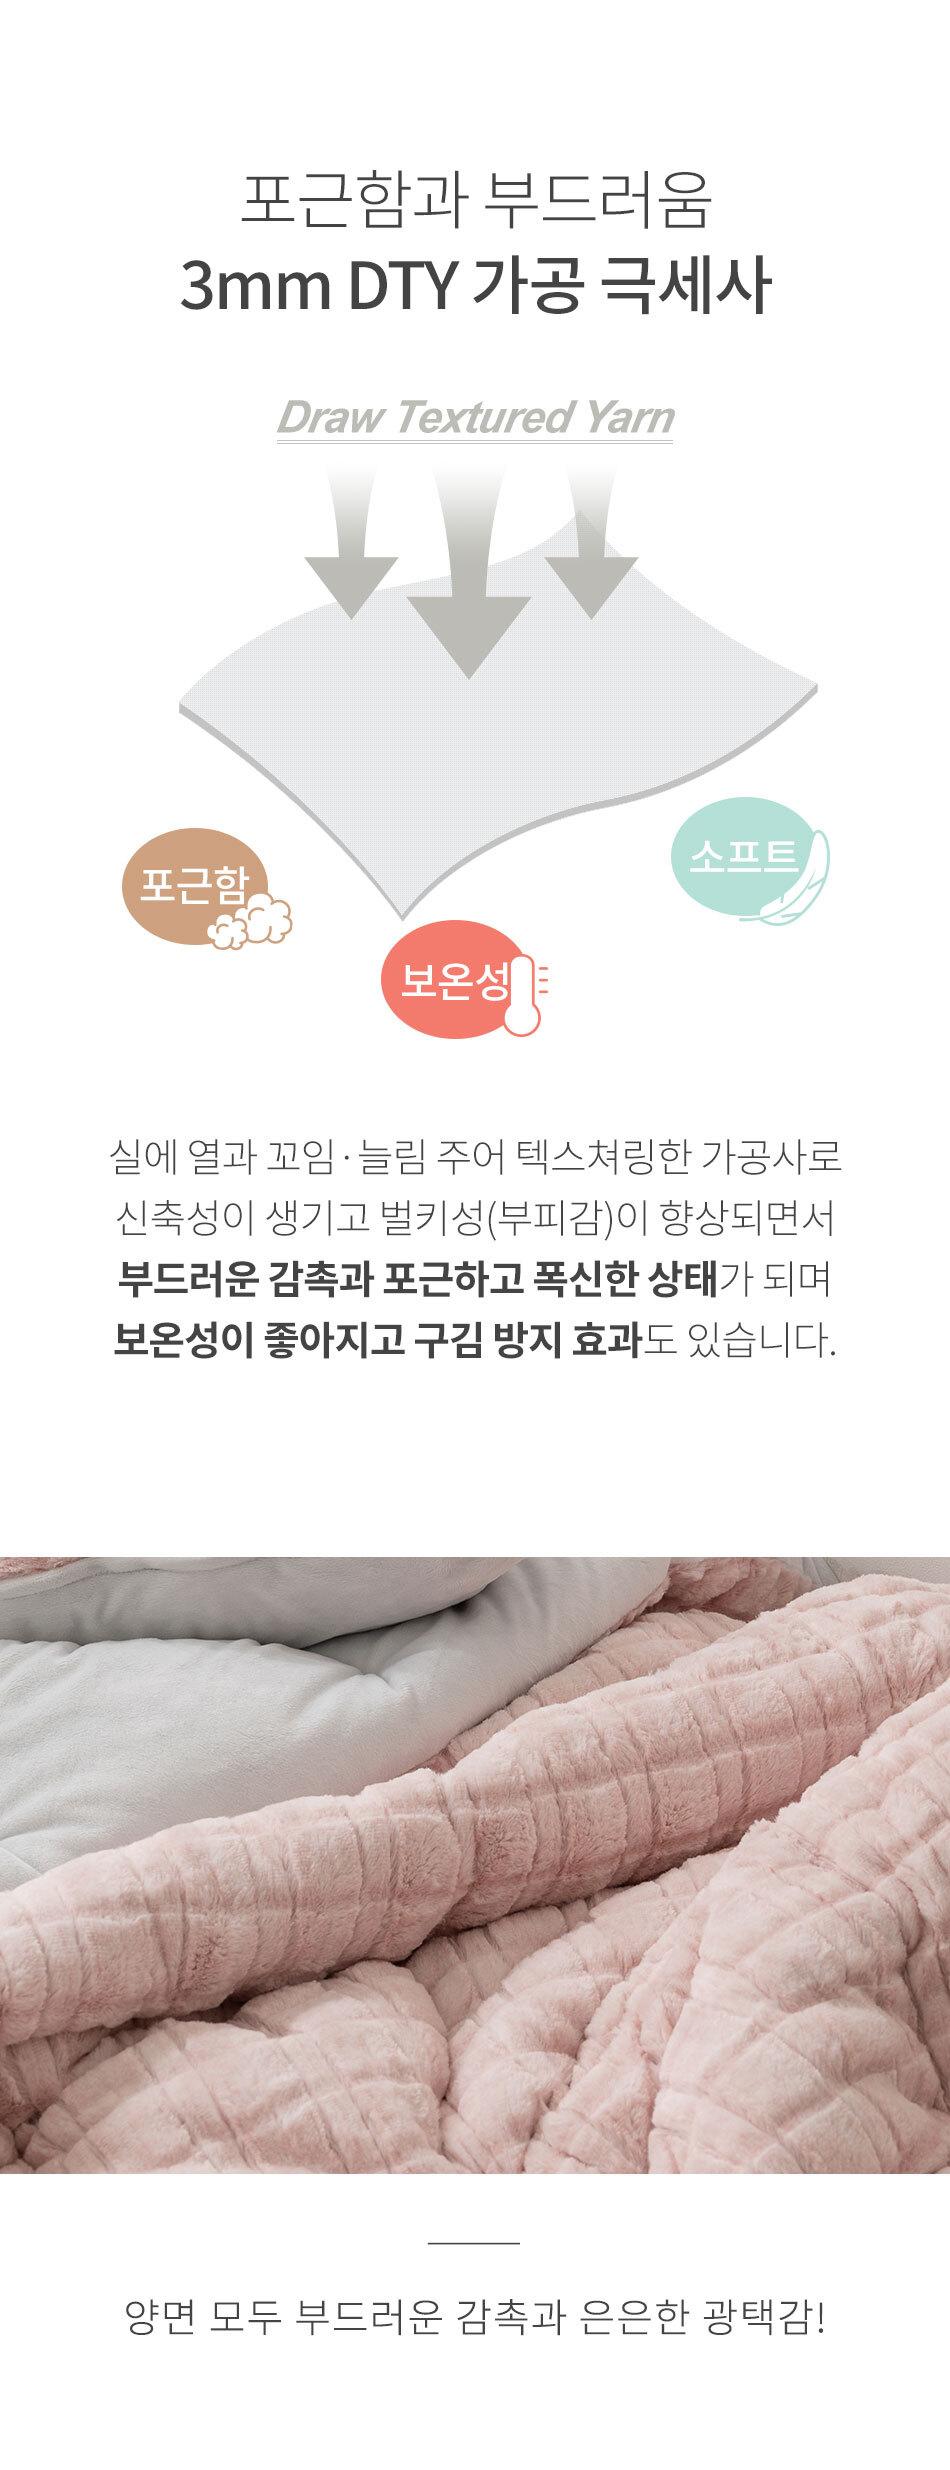 chou_bed_02.jpg